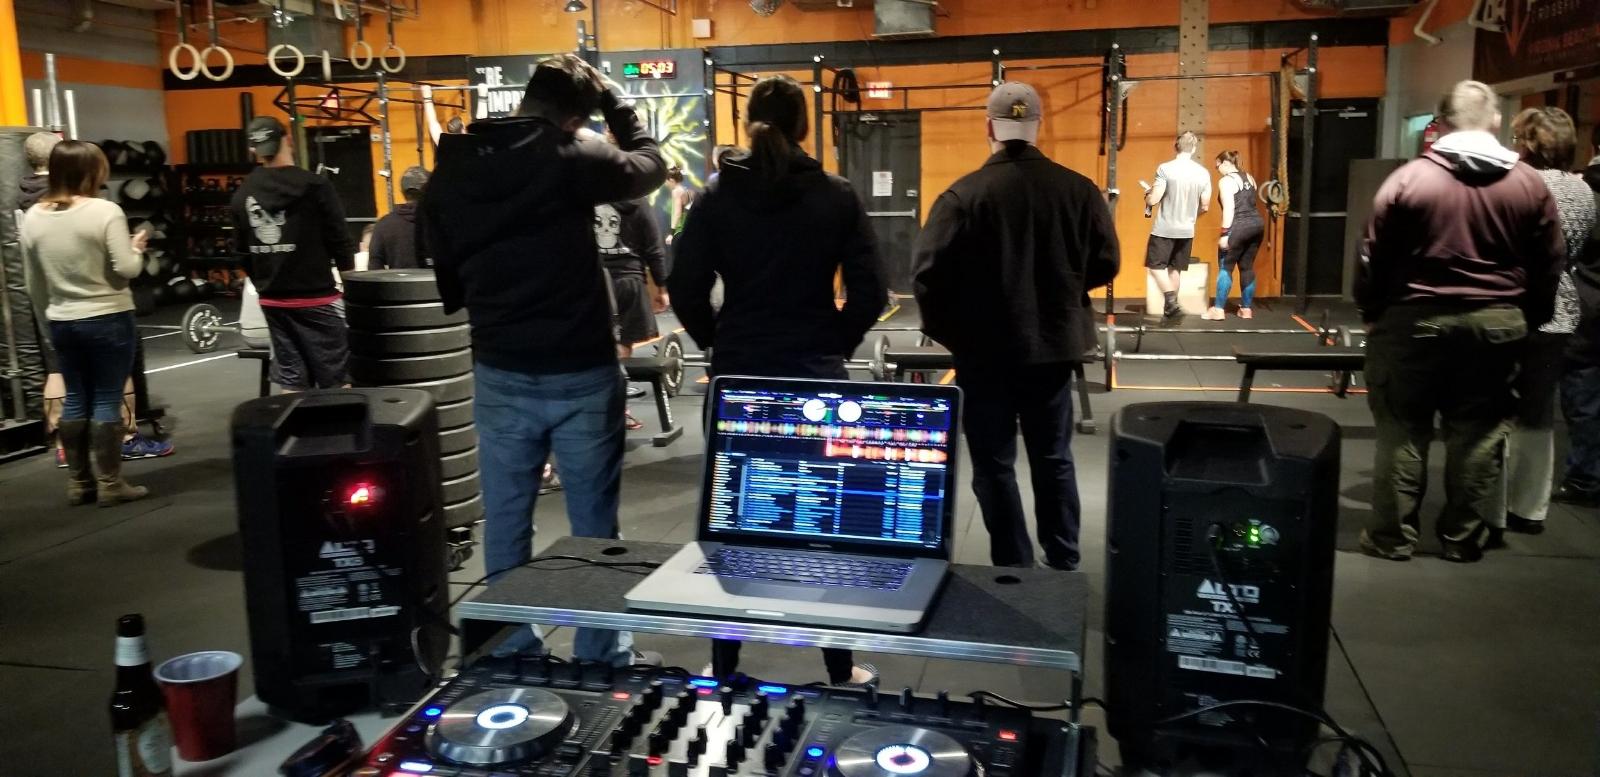 deandre aka as dj serius, crossfit open 2018-friday night lights